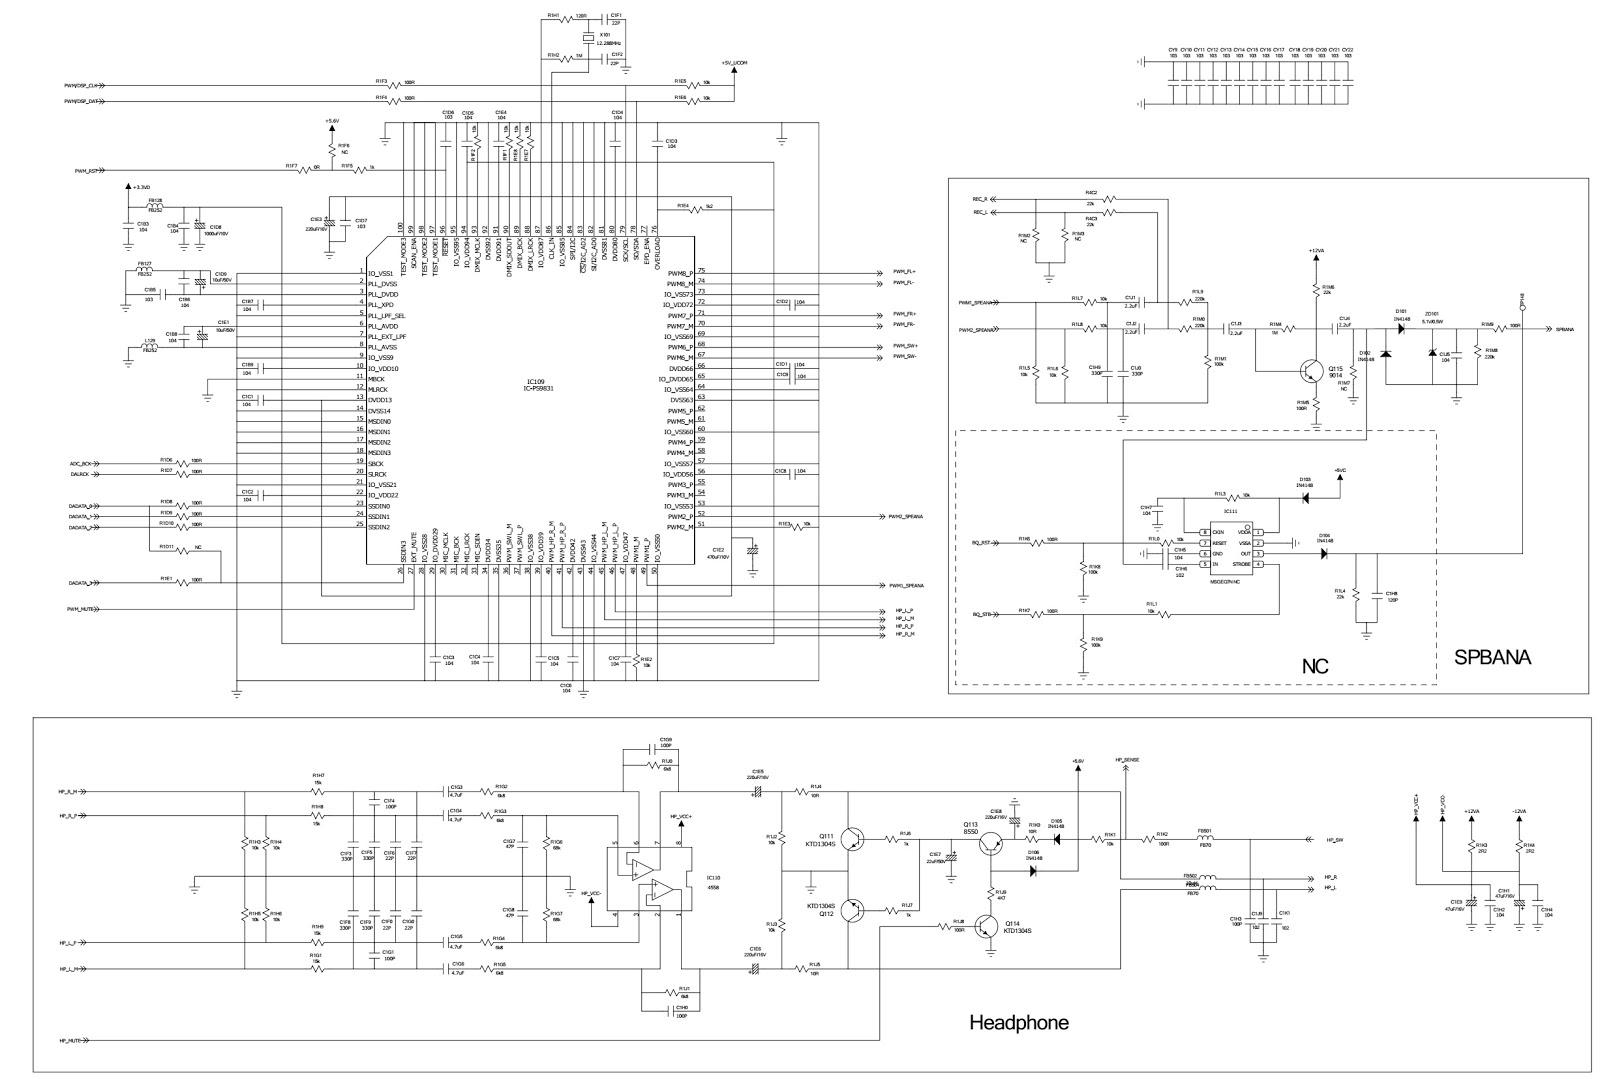 medium resolution of lg dm5620k dm5620k dms5620v w karaoke dvd mini hi fi system smps circuit diagram